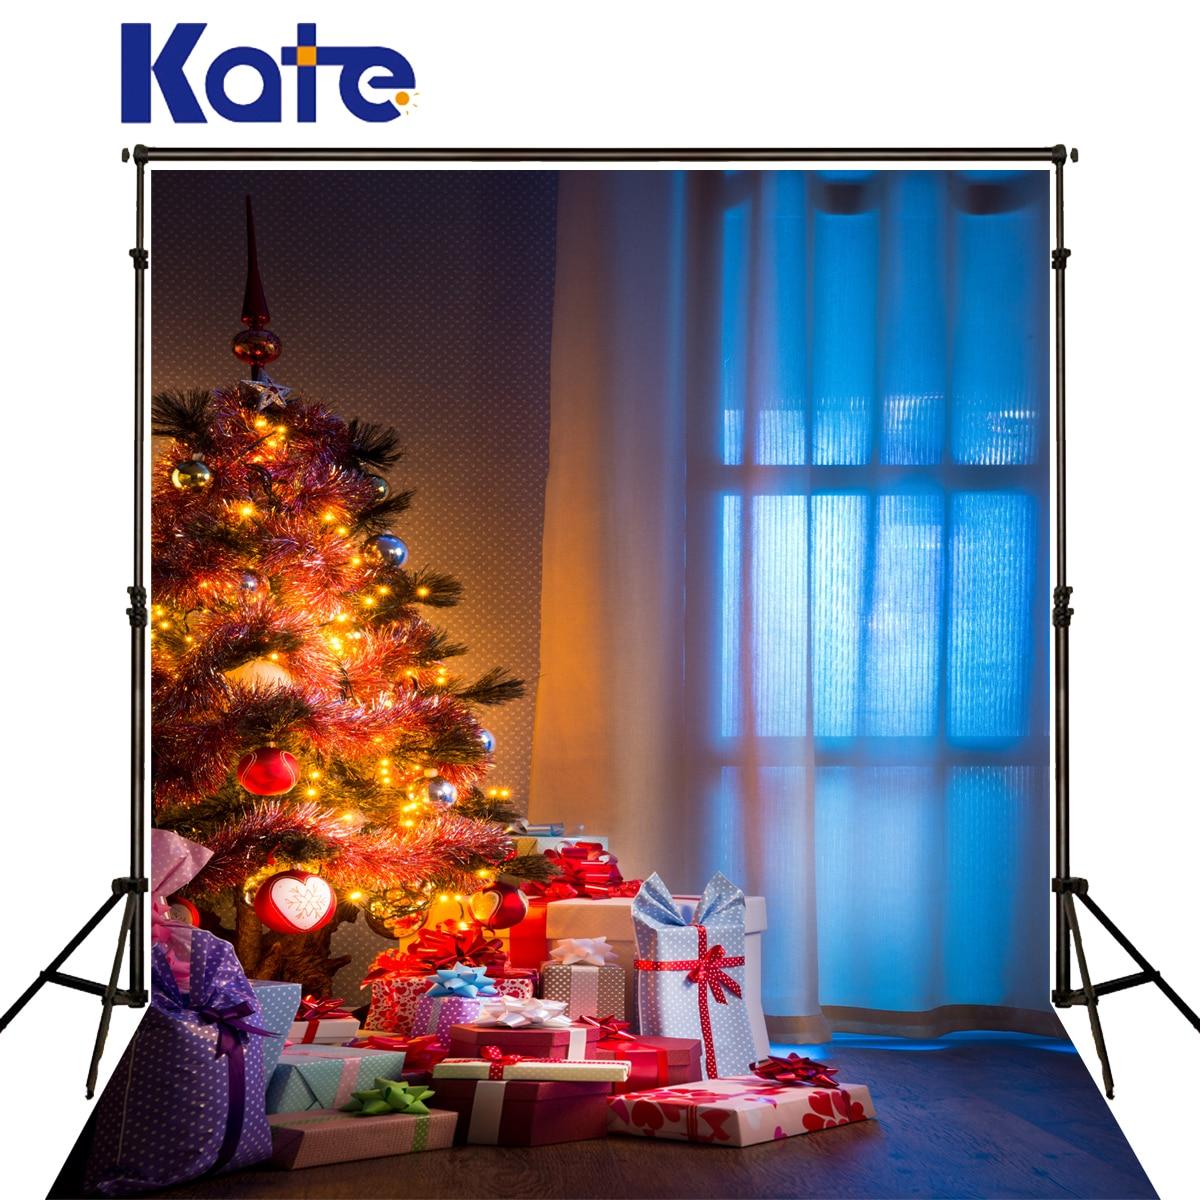 Kate Christmas Photography Background Curtain Wood Floor Fondo Fotografico De Estudio Color Lights Backdrops For Photo Shoot